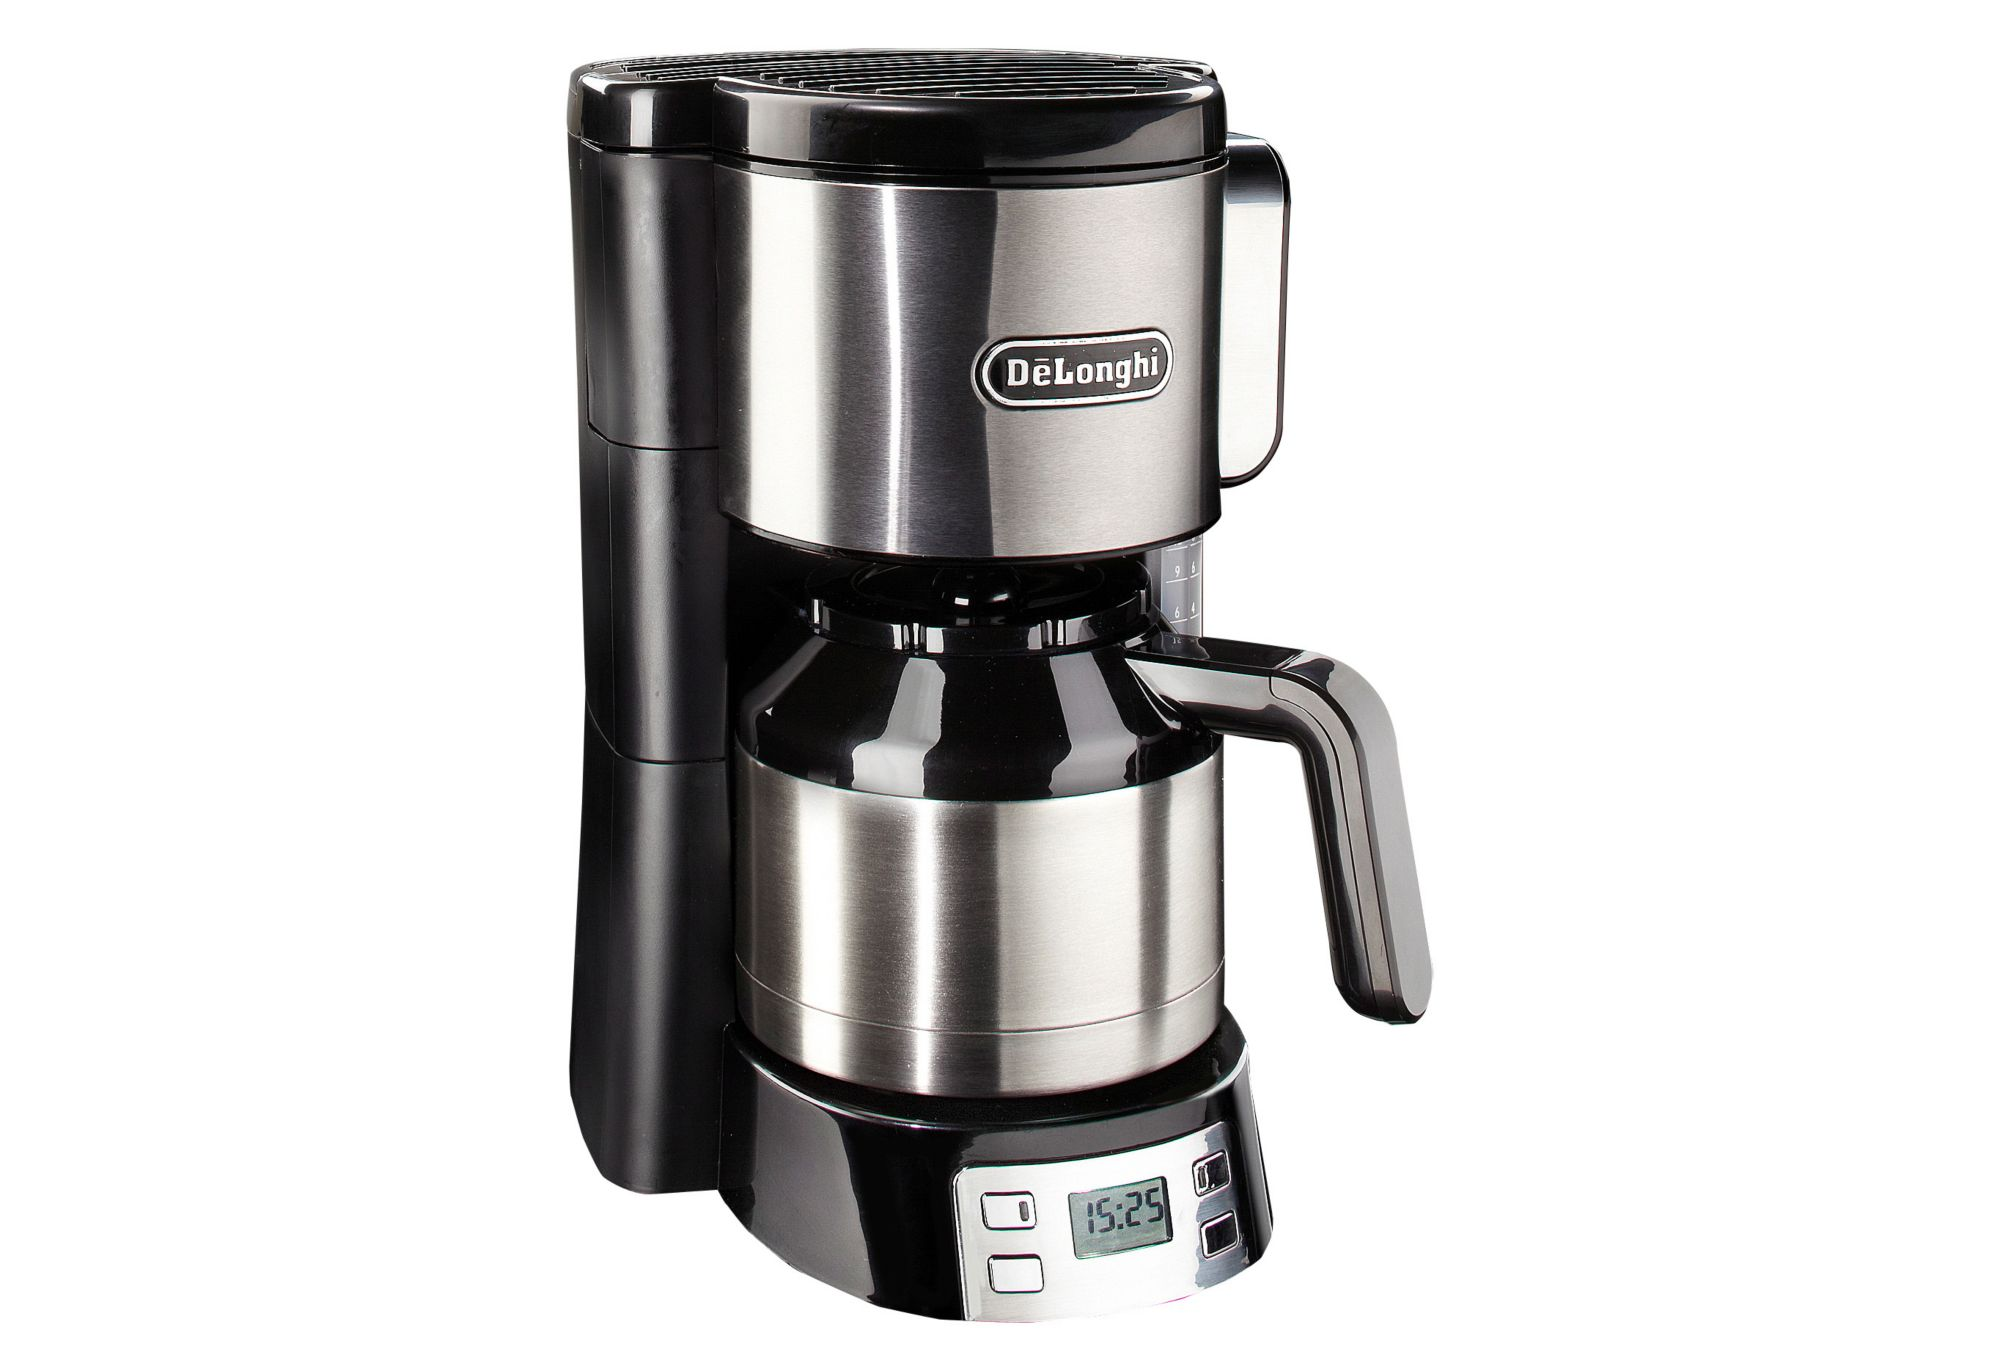 de longhi kaffeemaschine icm15750 mit 1 25 l thermokanne abschaltautomatik 1000 watt. Black Bedroom Furniture Sets. Home Design Ideas